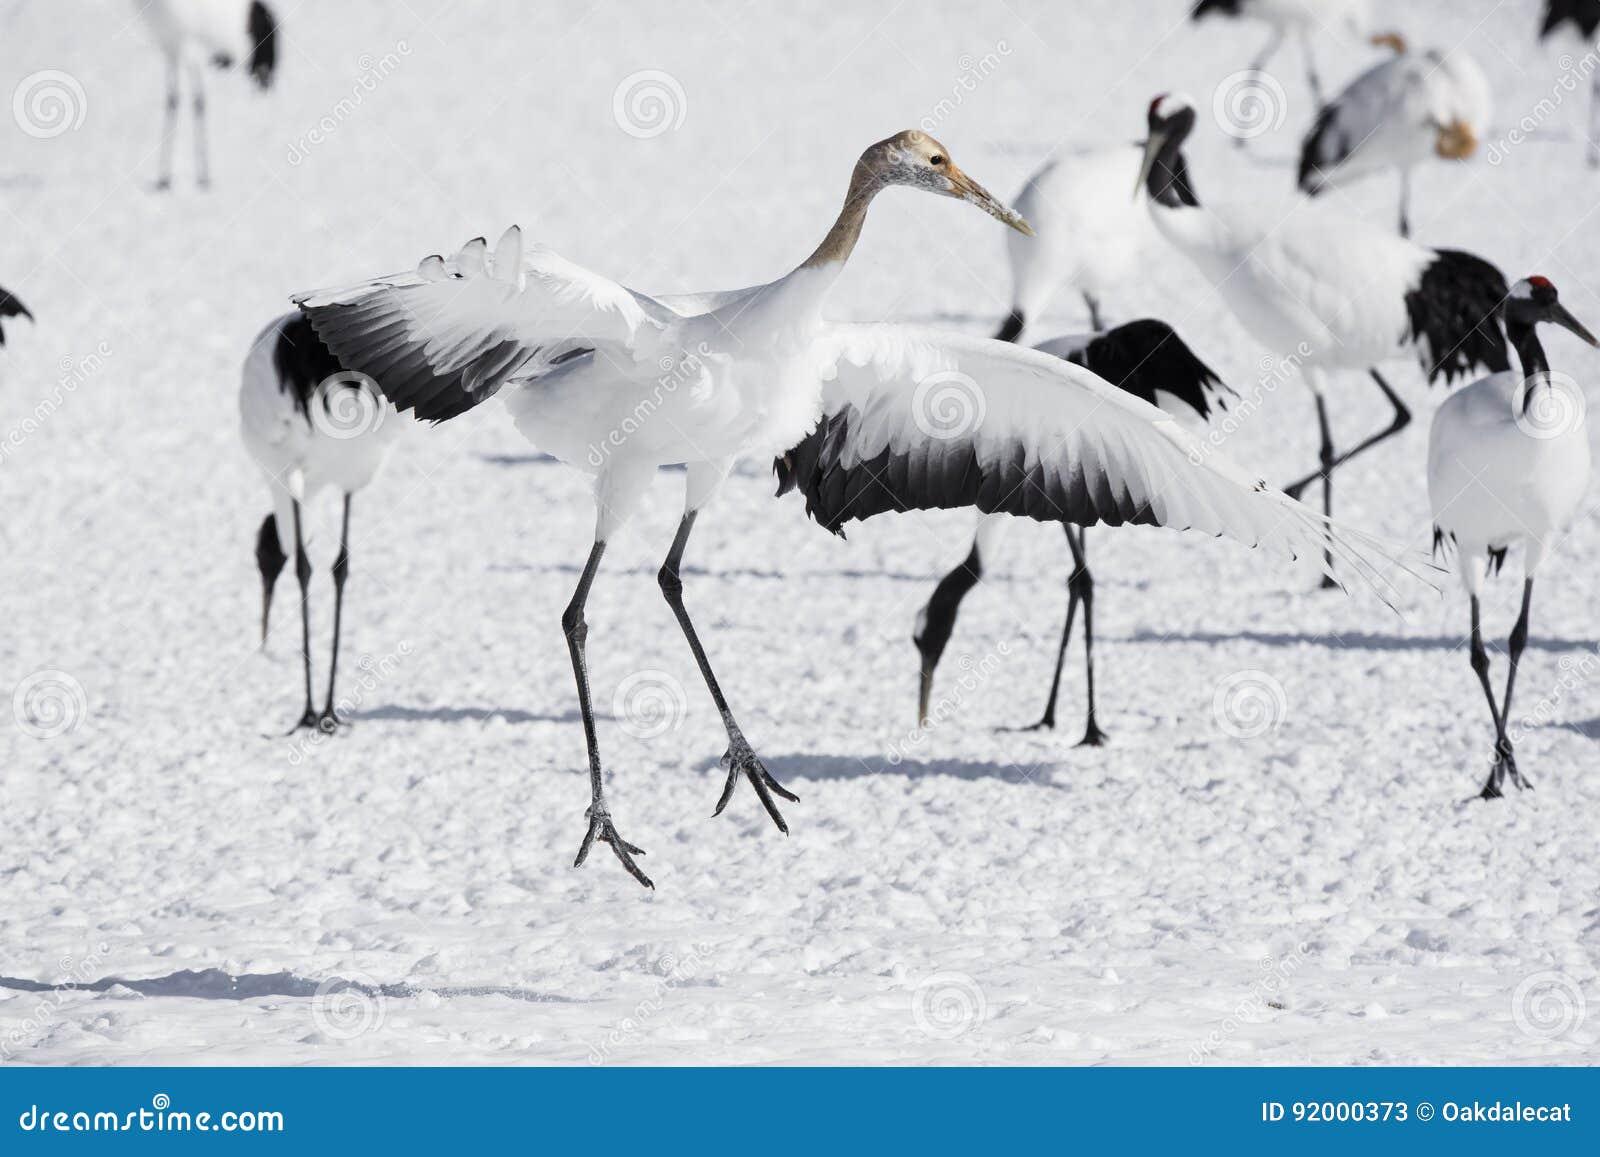 Onrijp Rood Bekroond Crane Imitating Courtship Dance